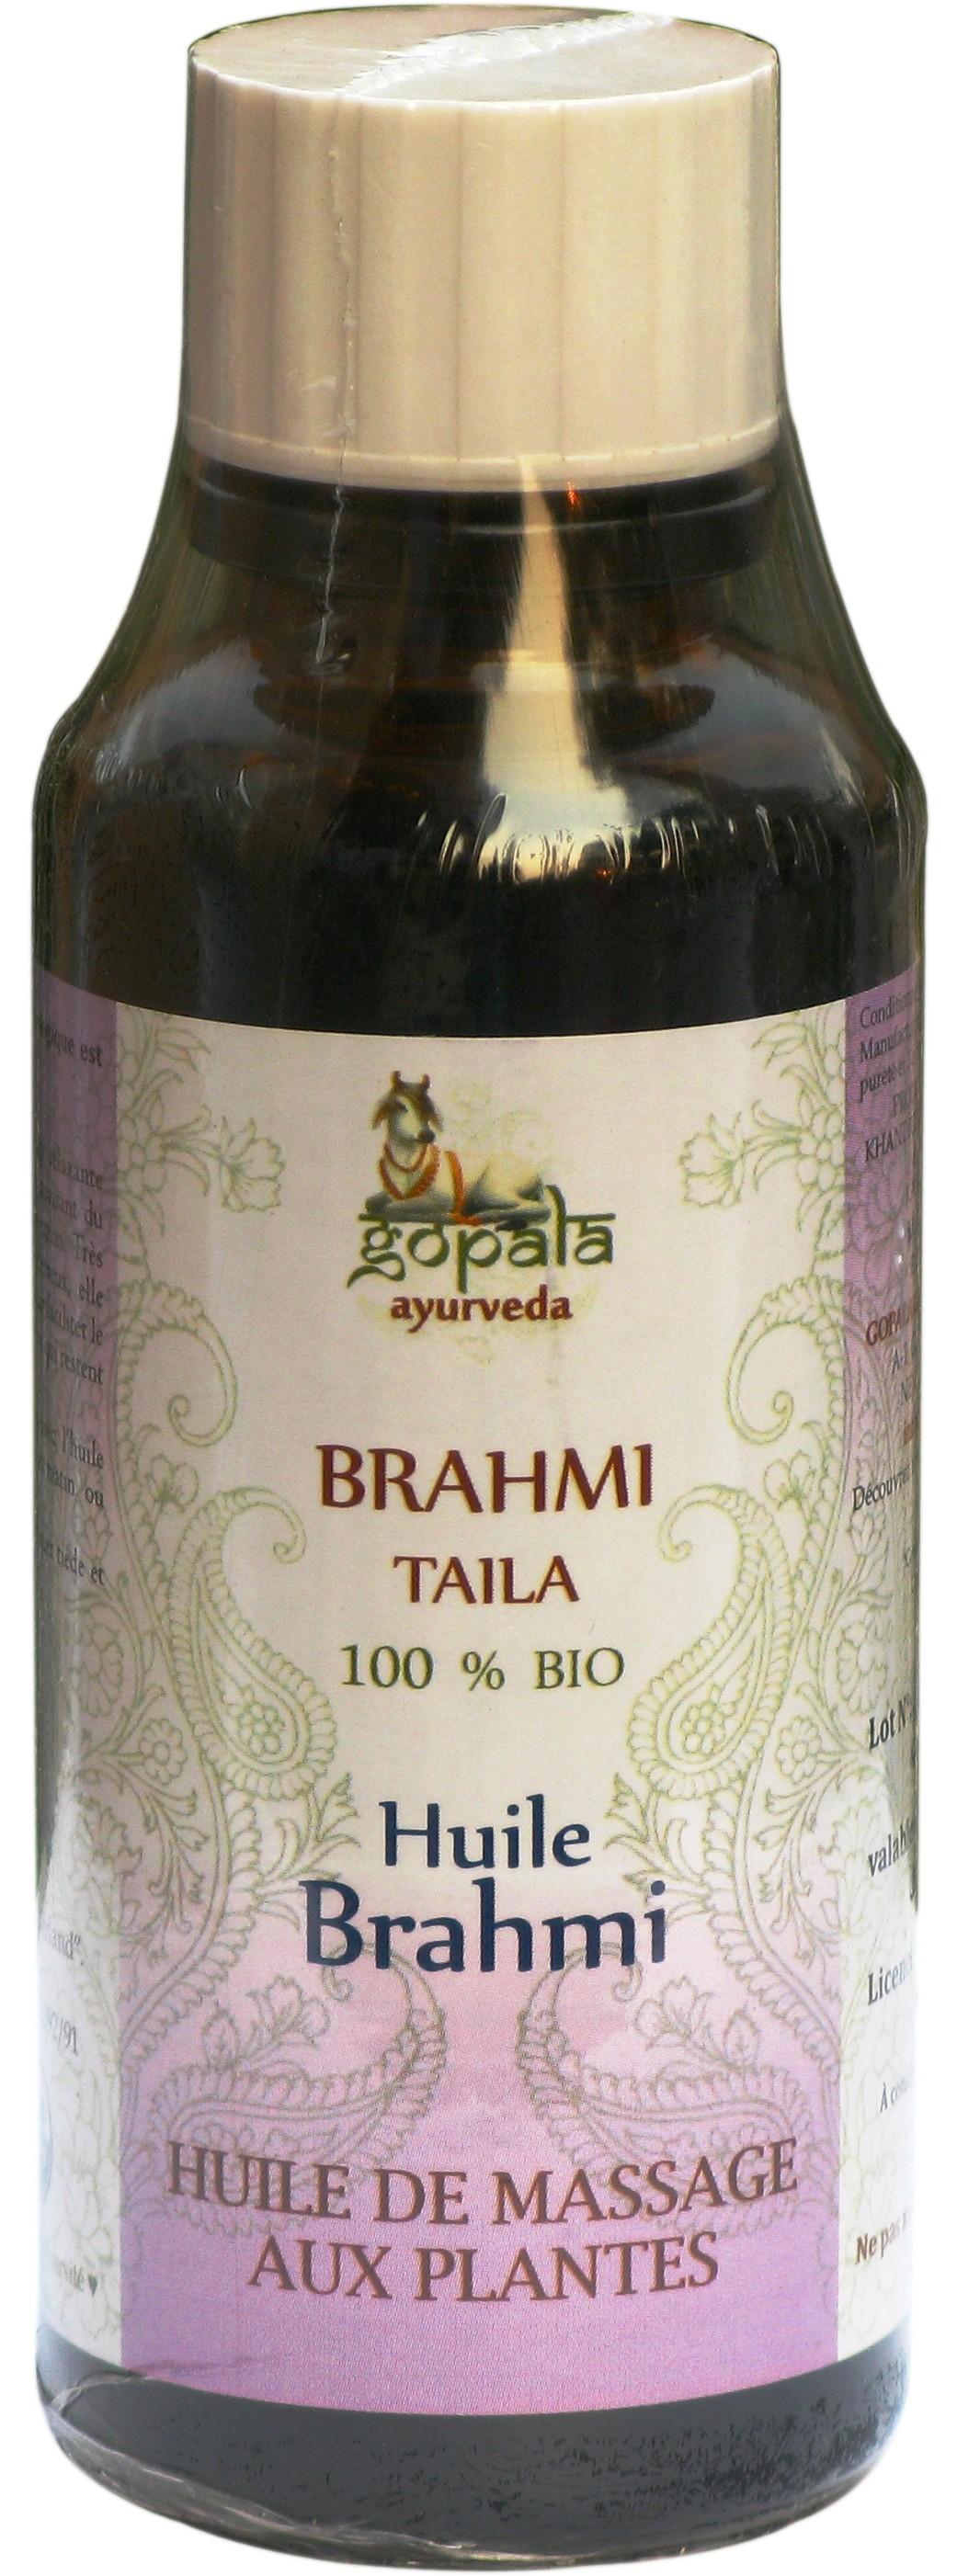 Gopala Ayurveda BRAHMI Taila BIO